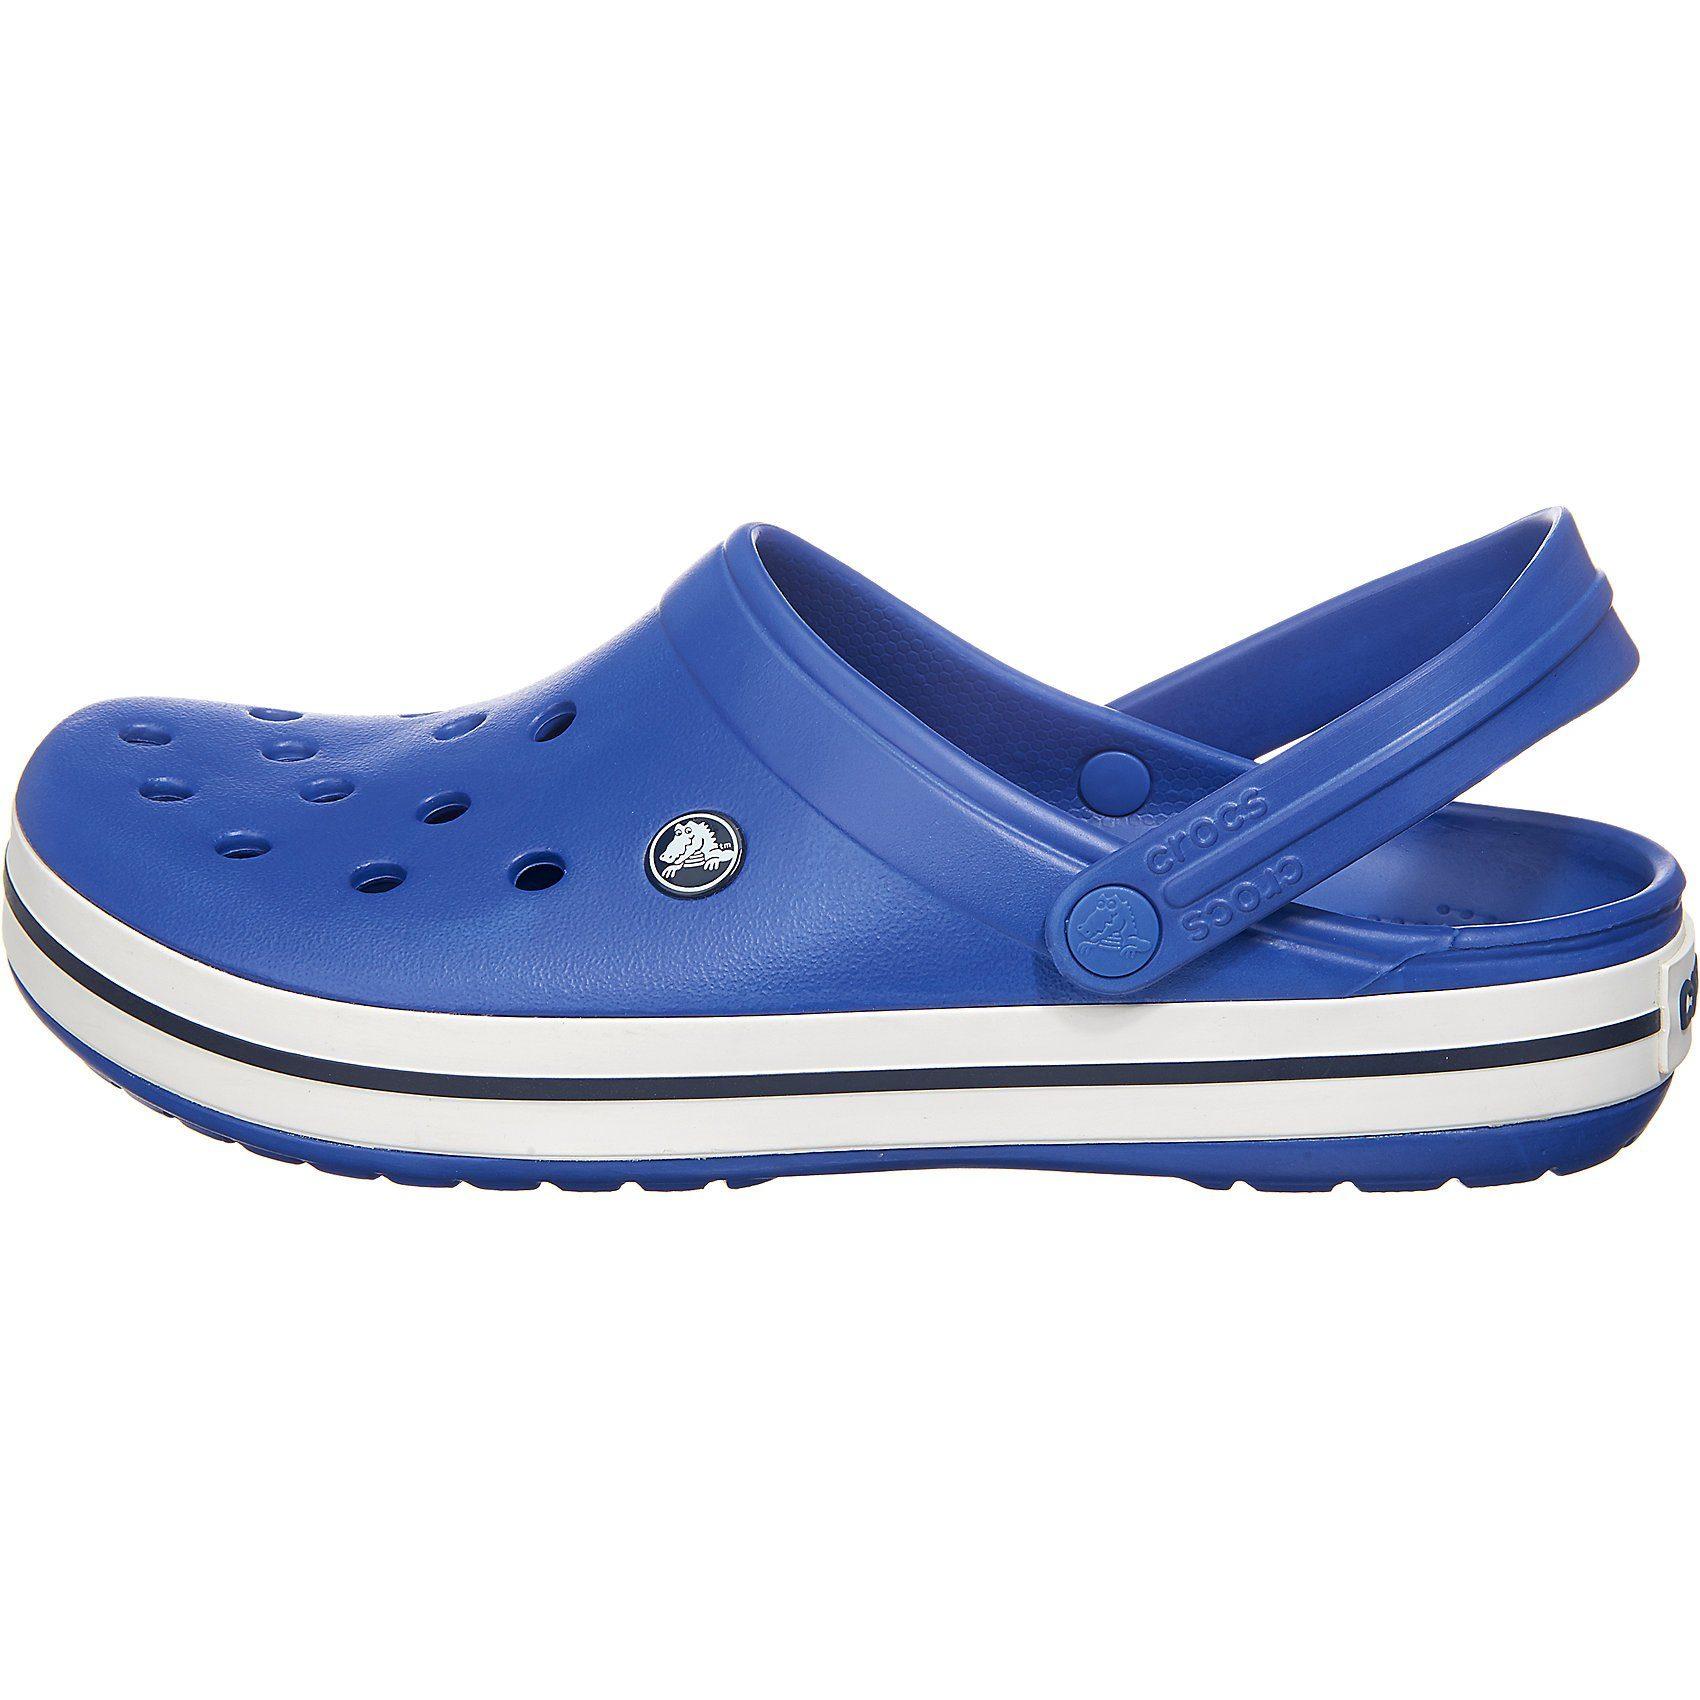 CROCS Crocband Clogs online kaufen  blau